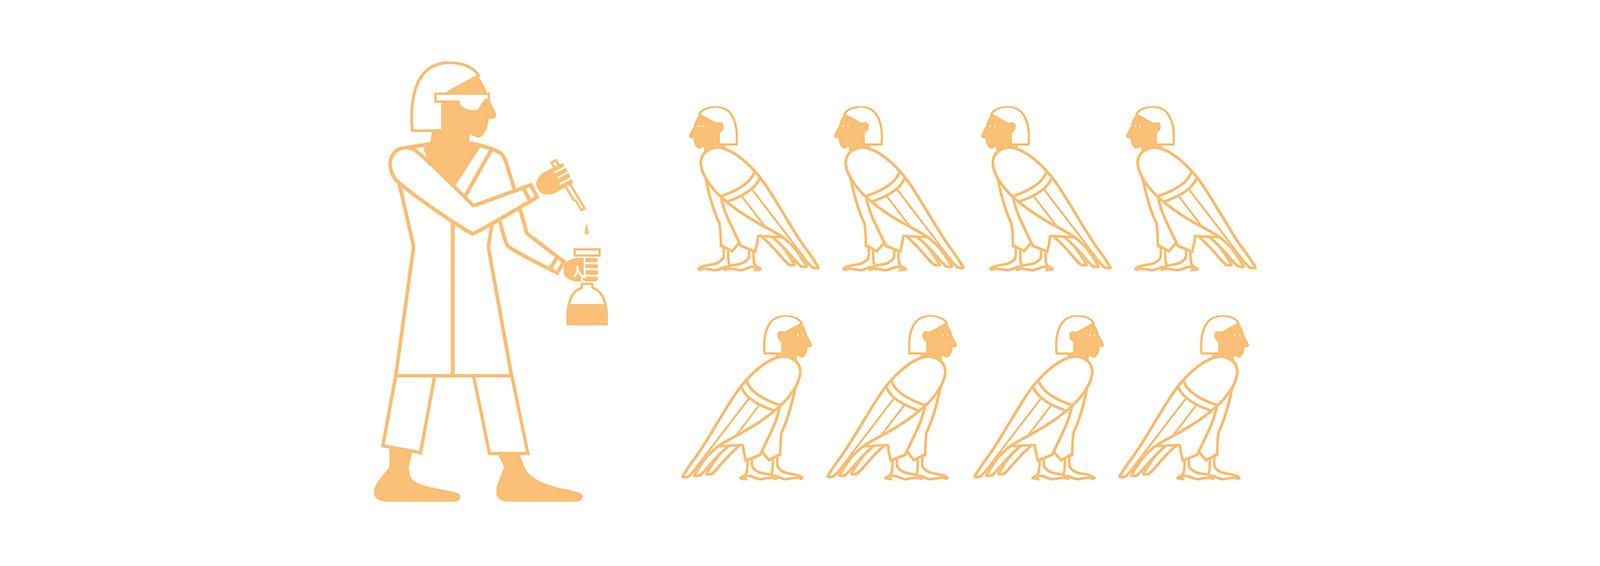 esLebeDerKoenig_hieroglyphe_02